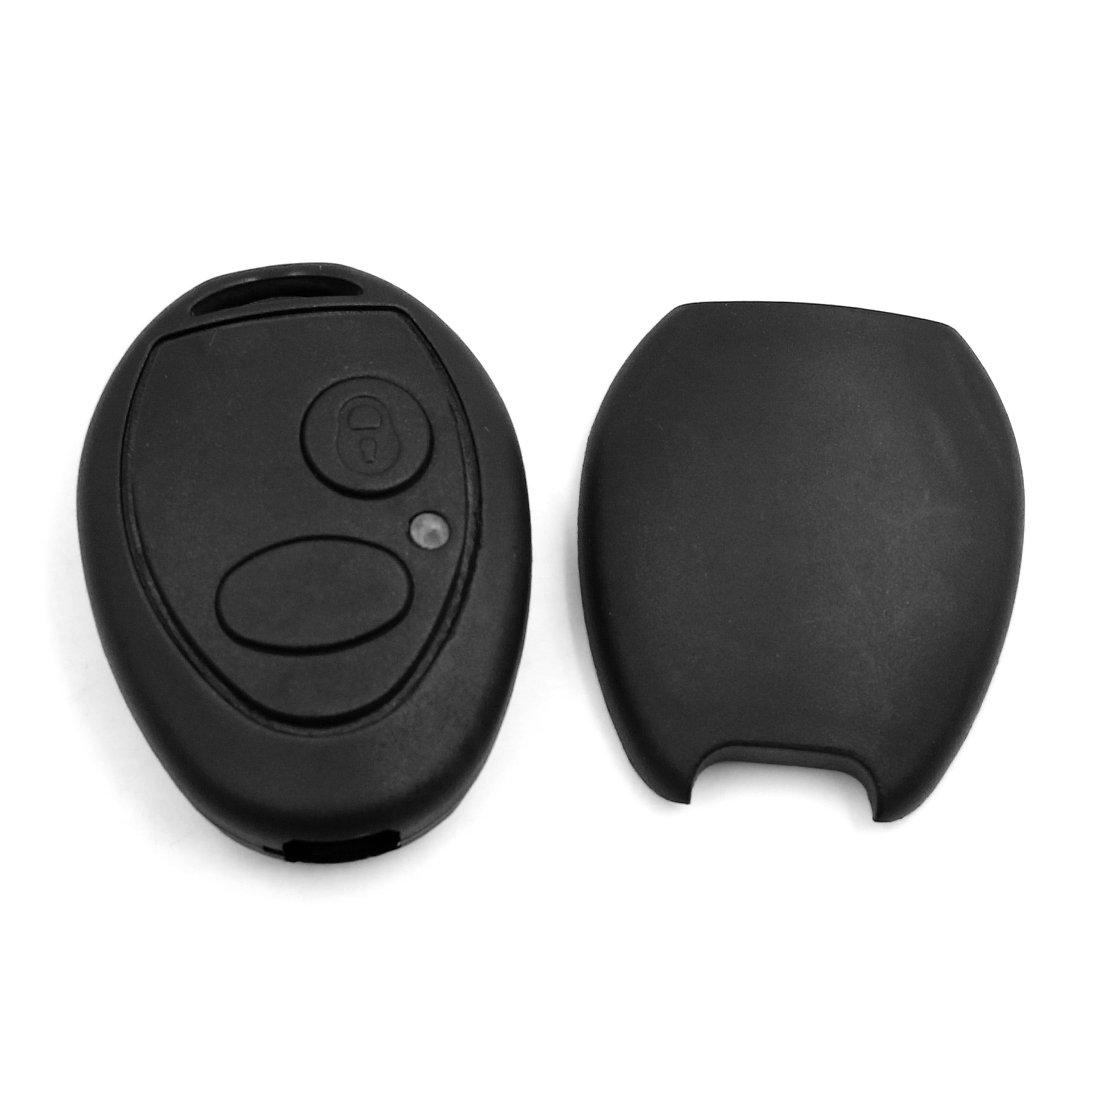 Sourcingmap N5FVALTX3 2-Botones Llave de Coche Carcasa para Discovery